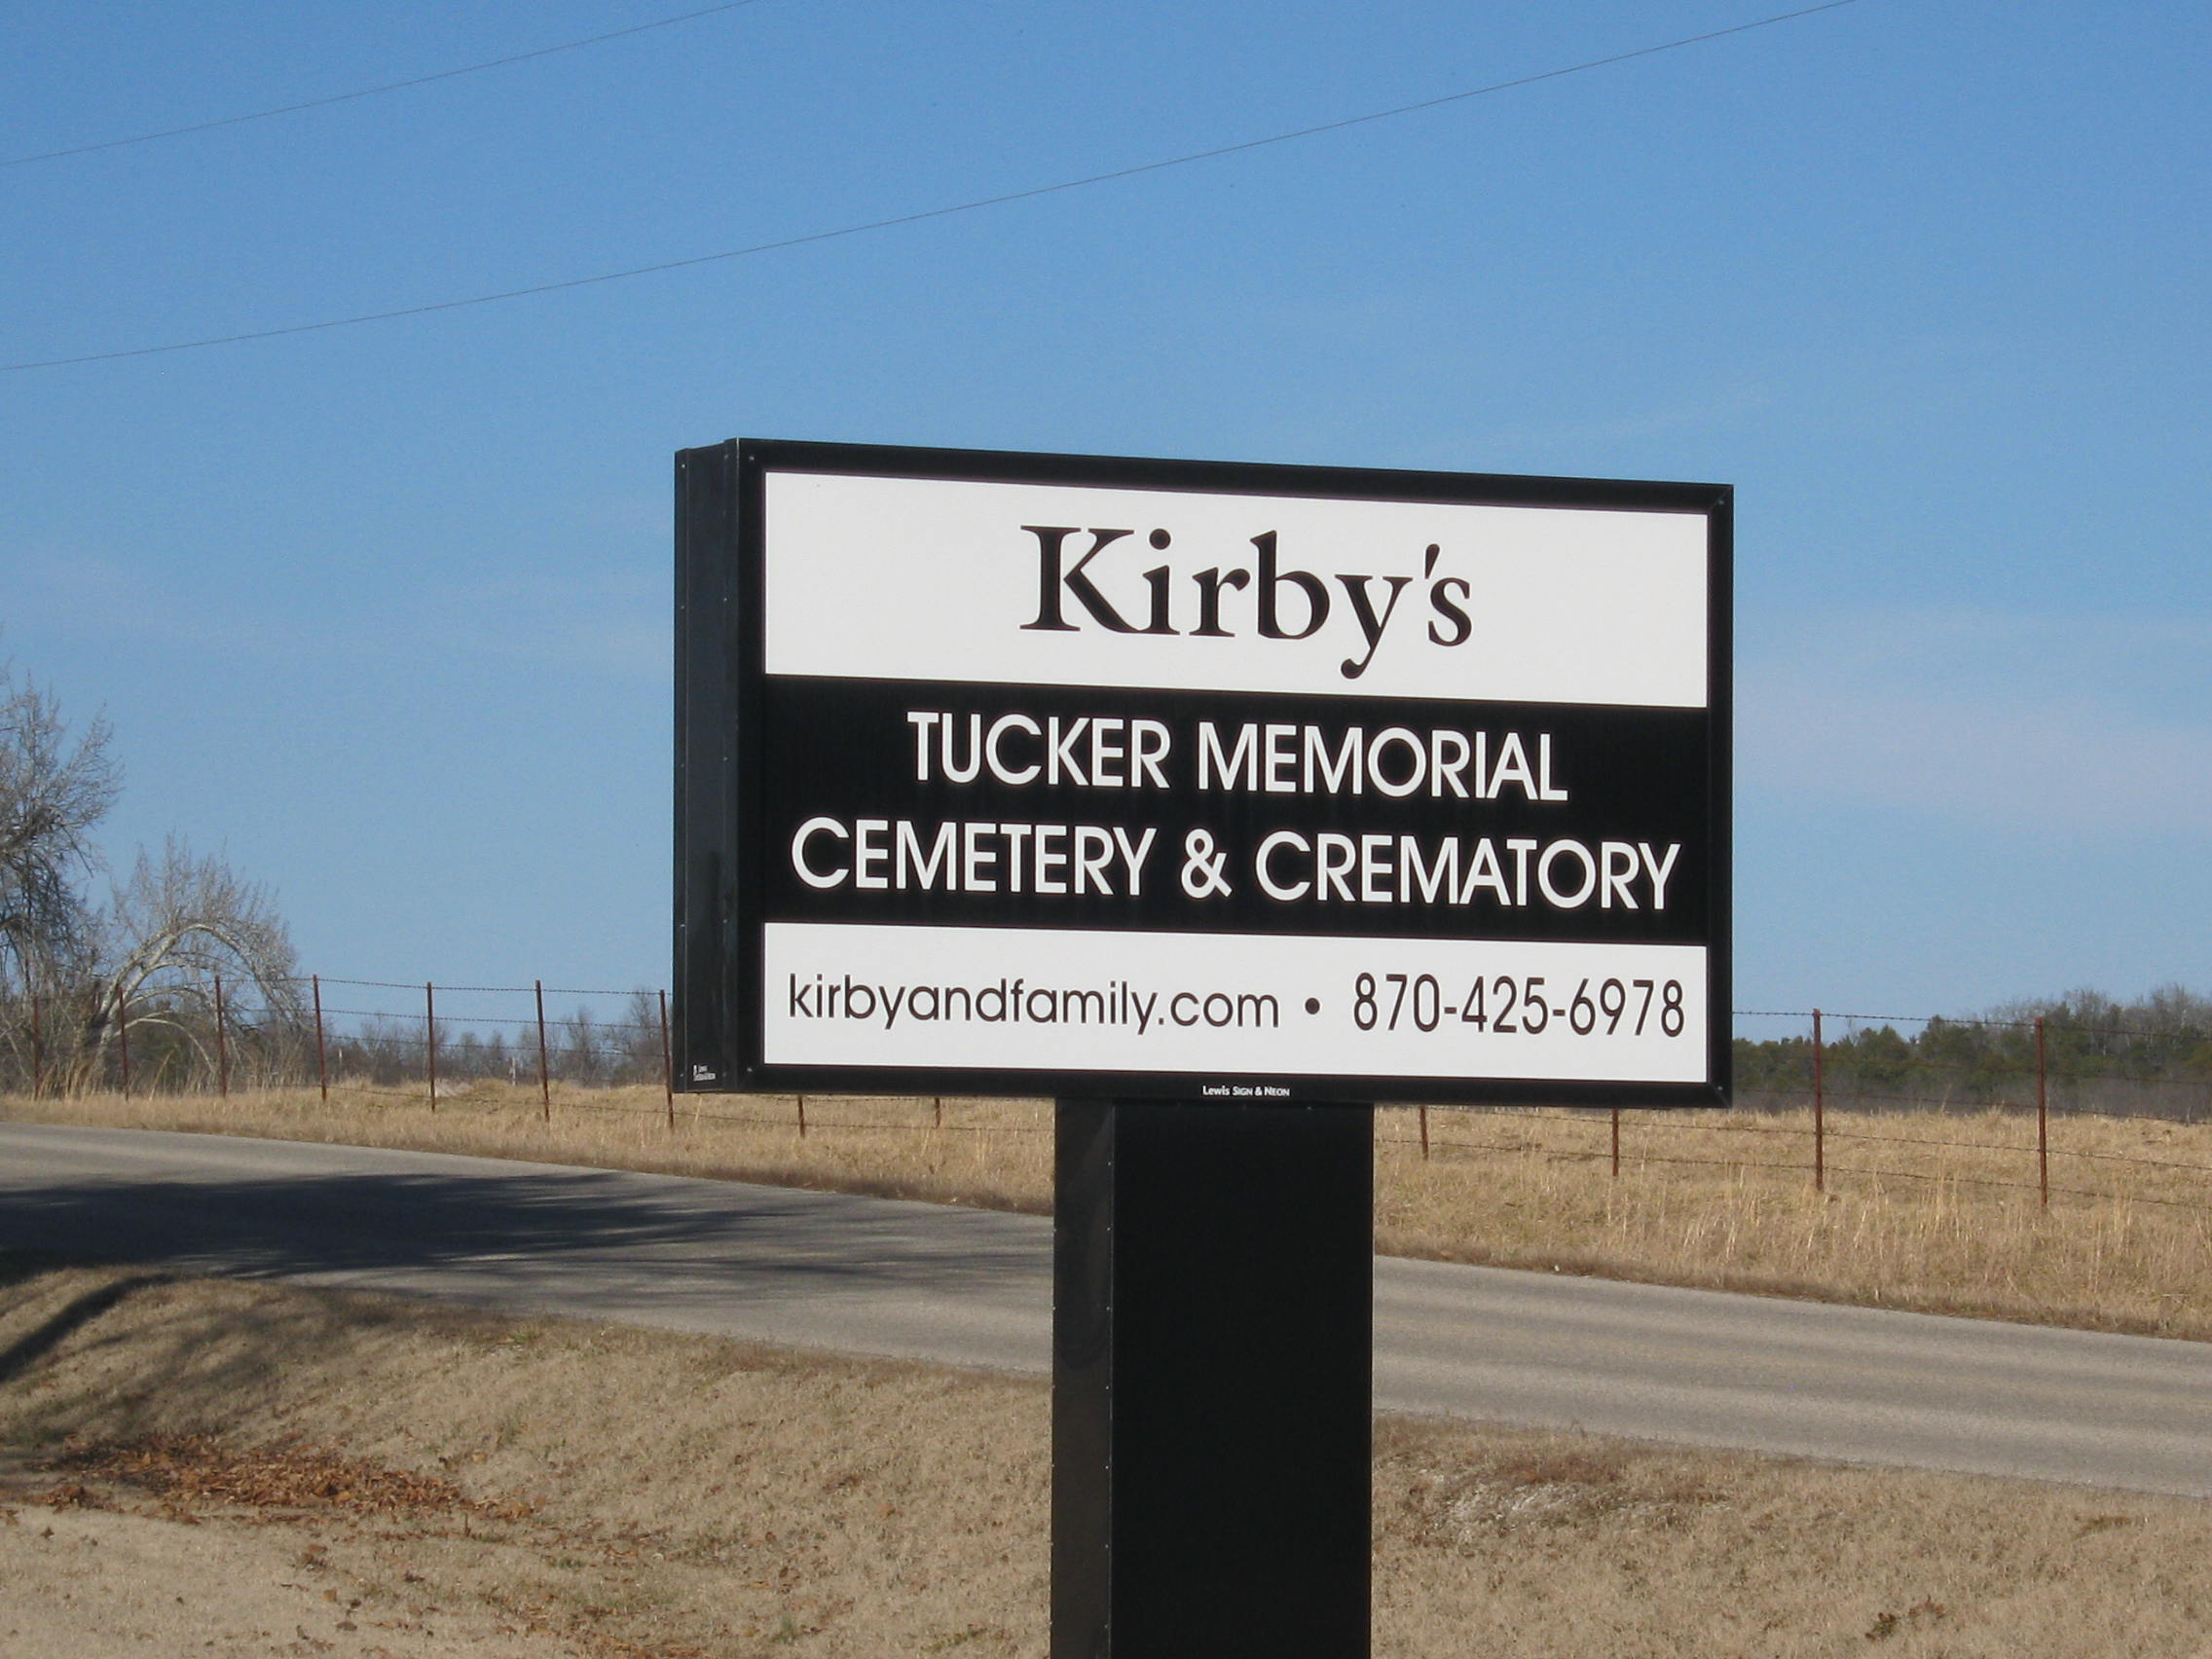 Kirbys Tucker Memorial Cemetery